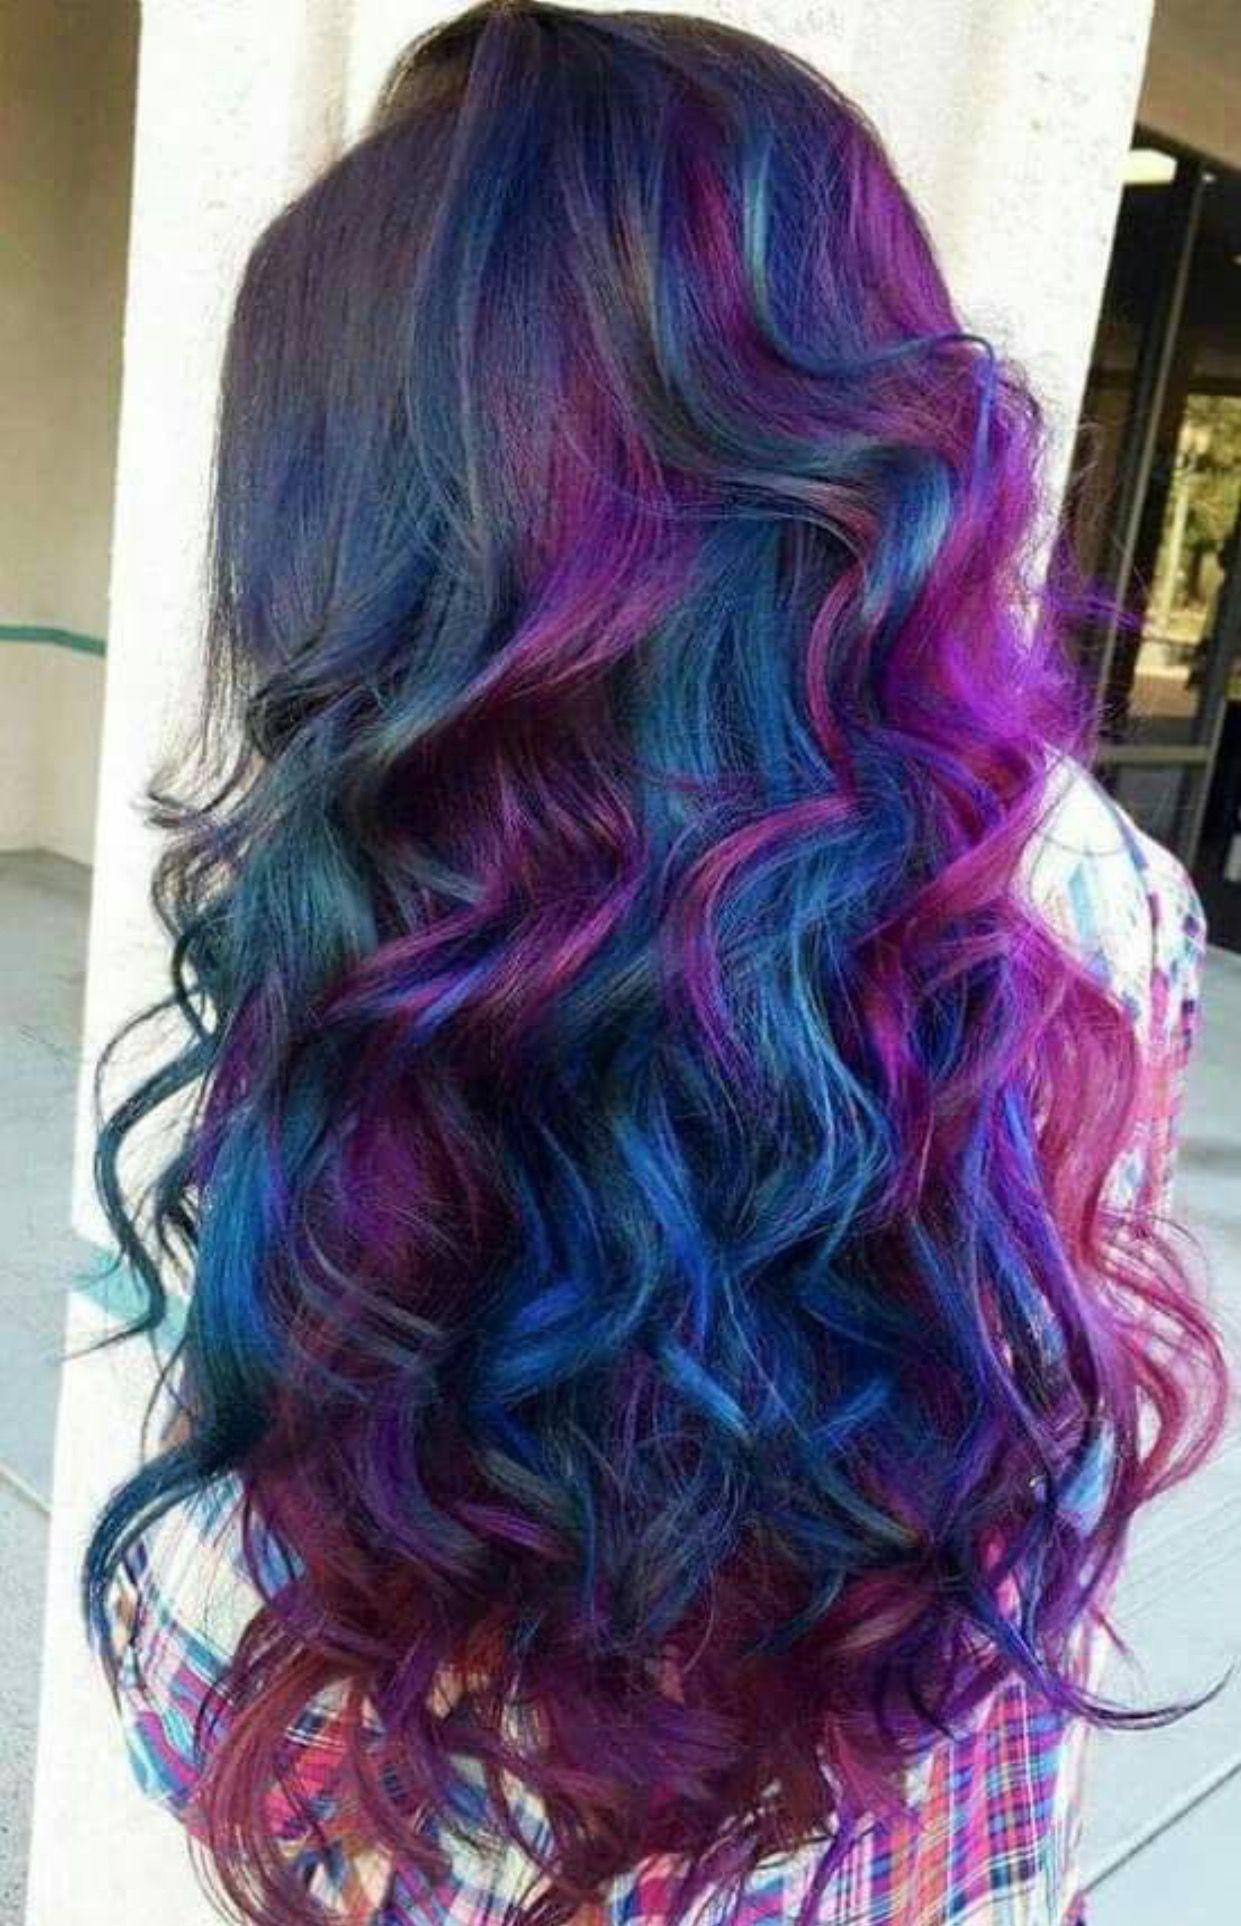 Purple And Blue Hair Oil Slick Hair Color Hair Styles Dyed Hair